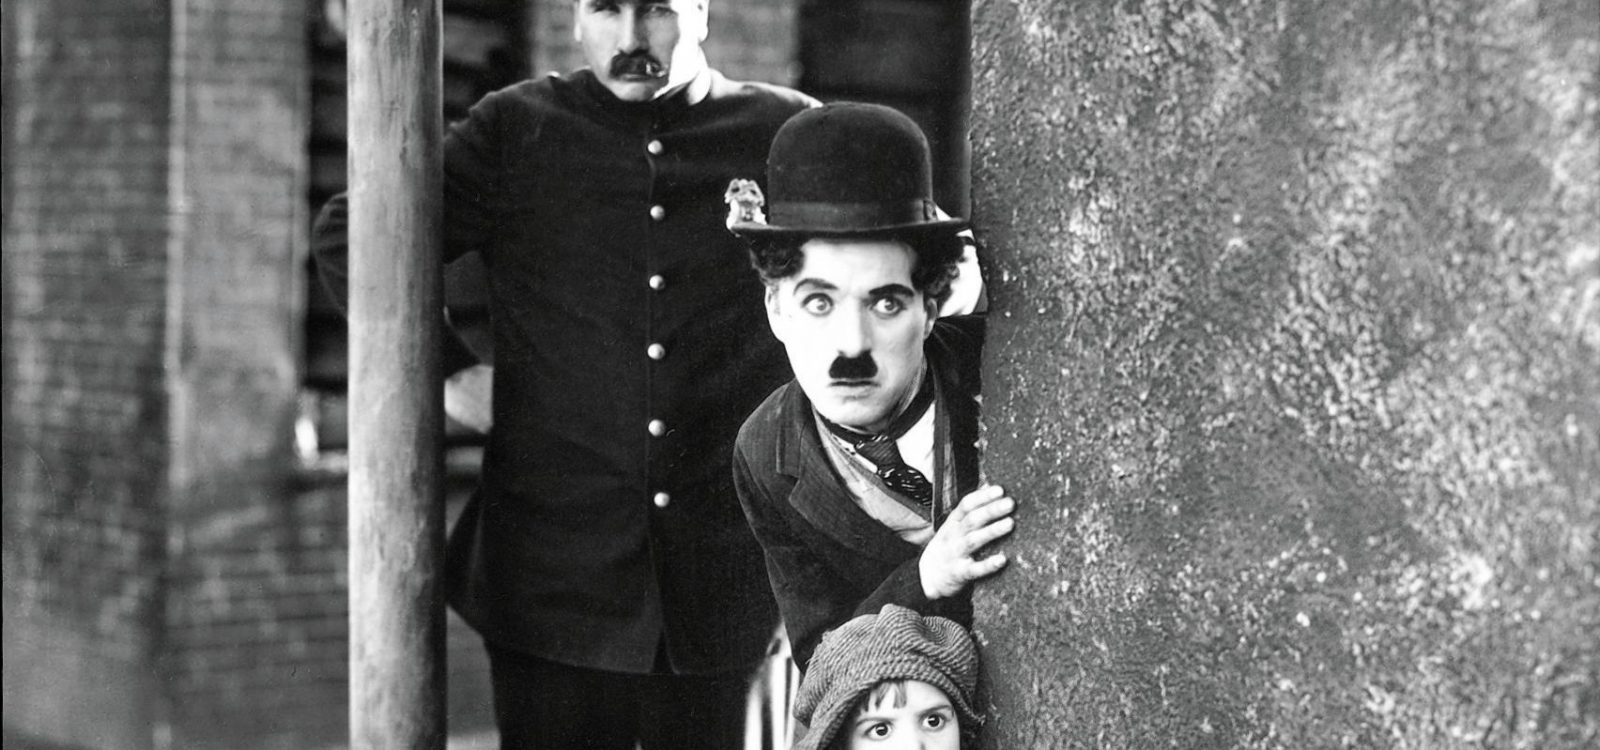 The Kid st 2 jpg sd high Charlie Chaplin Copyright Bubbles Inc S A THE KID Copyright Roy Export S A S 61532a8681ee8